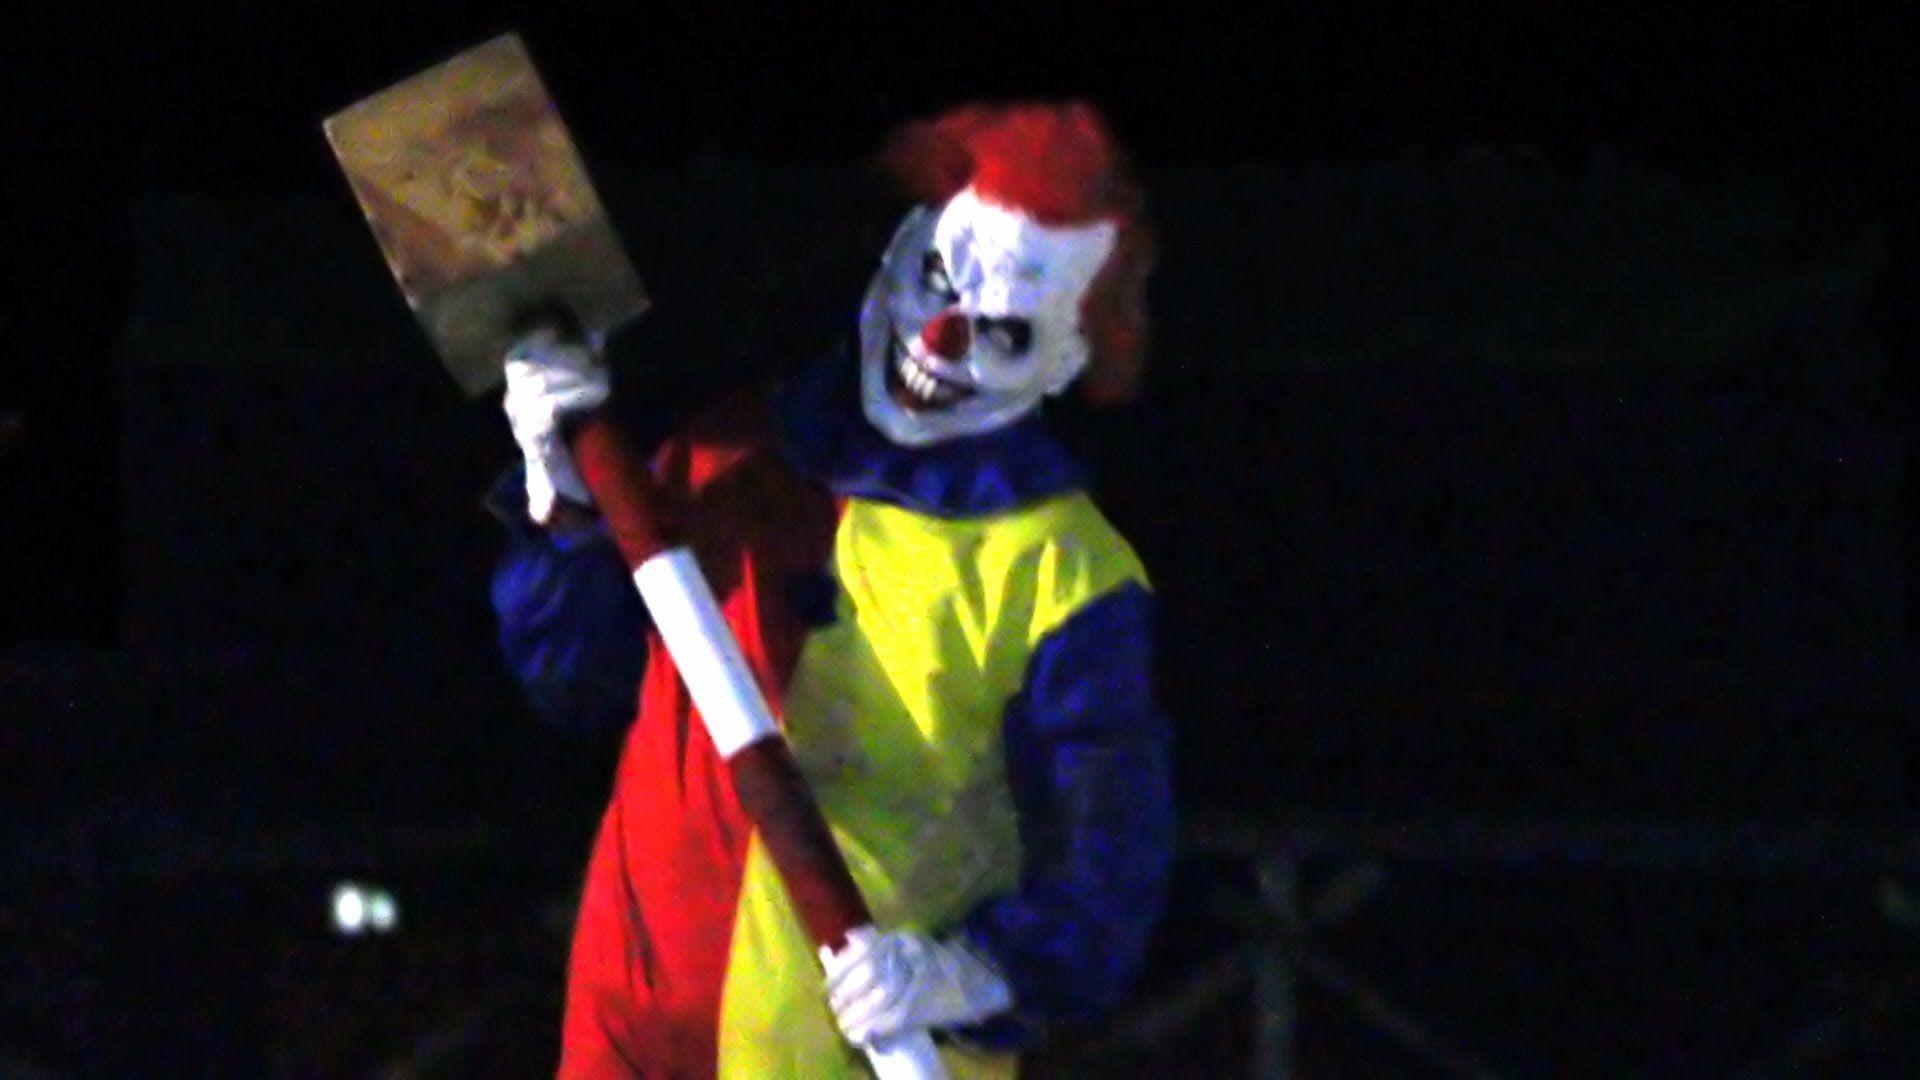 Evil Clown Wallpaper (63+ images)